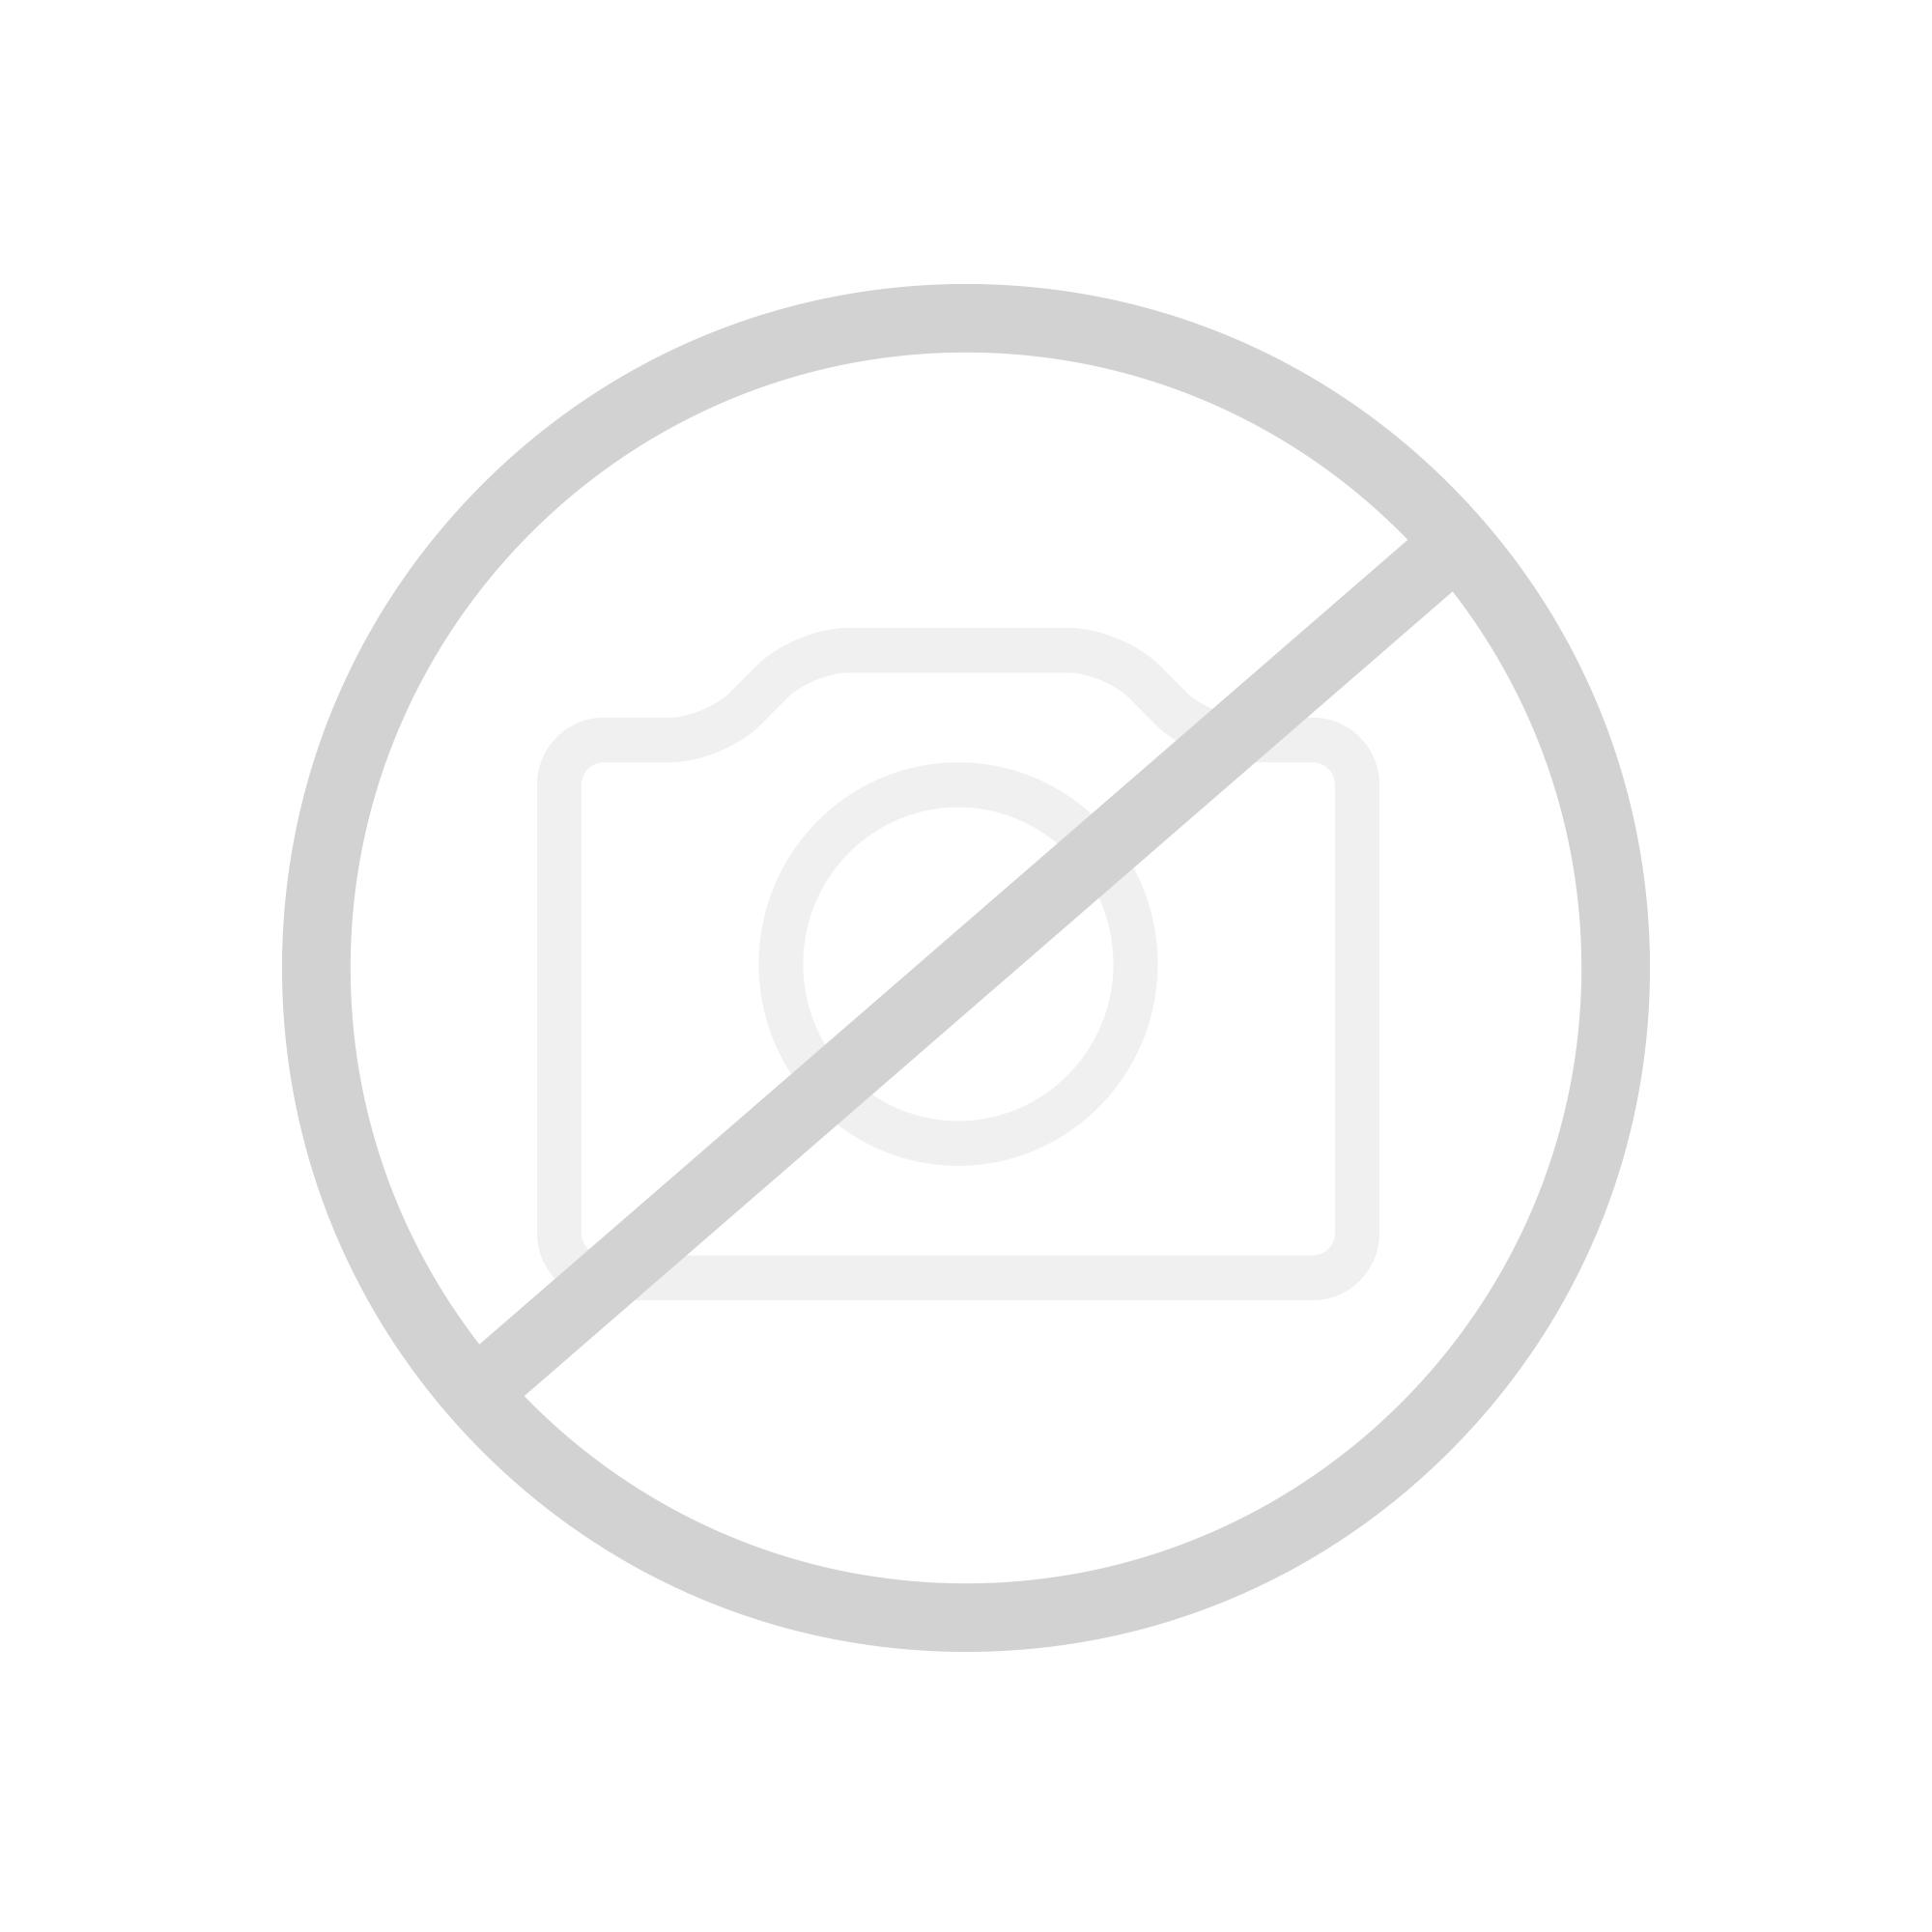 louis poulsen ph 3 2 tischleuchte 5744162801 reuter. Black Bedroom Furniture Sets. Home Design Ideas